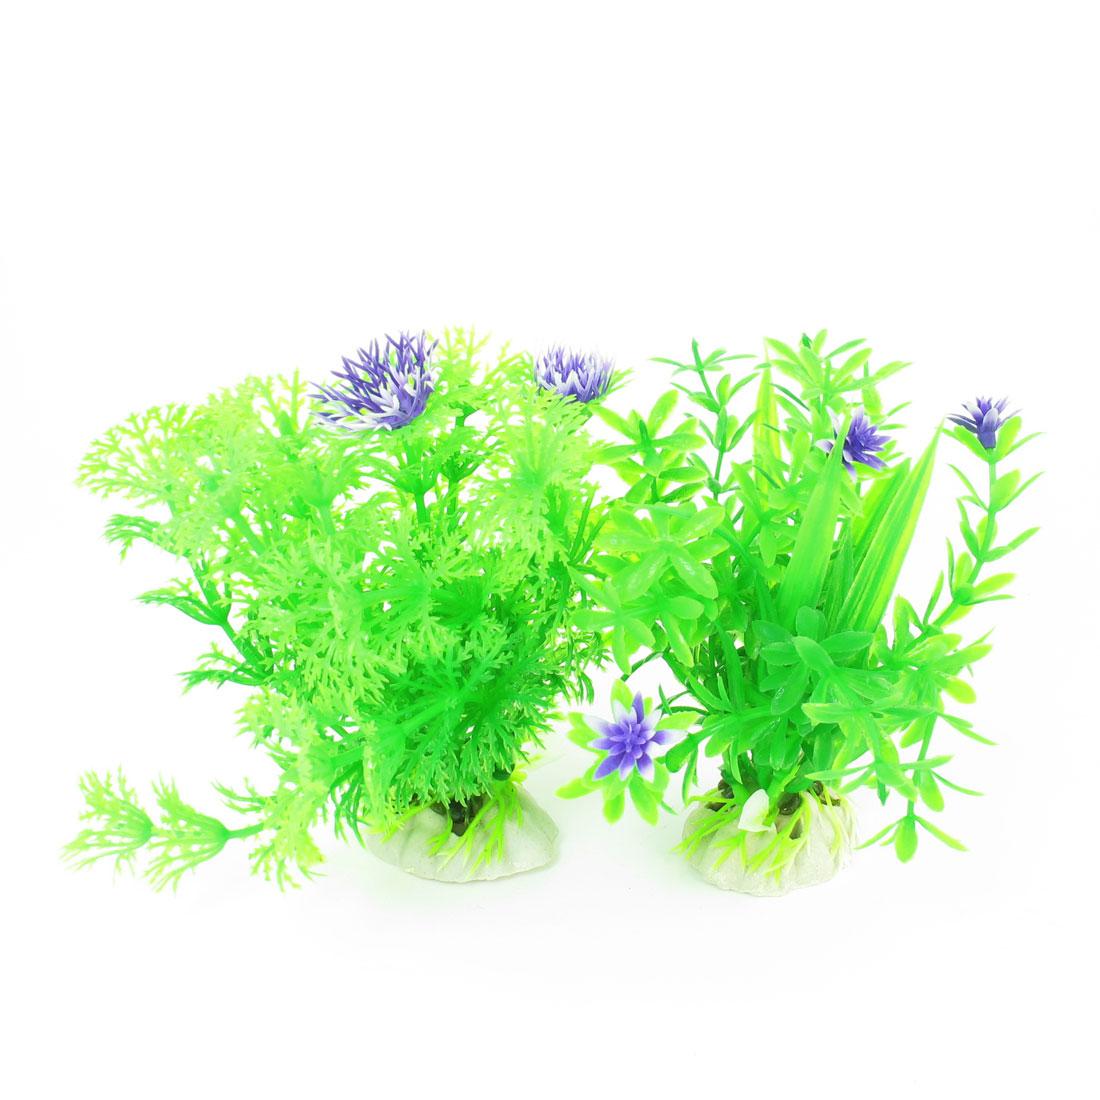 "2 Pcs Green Purple Emulational Fish Tank Aquarium Grasses Decor 4.1"" High"